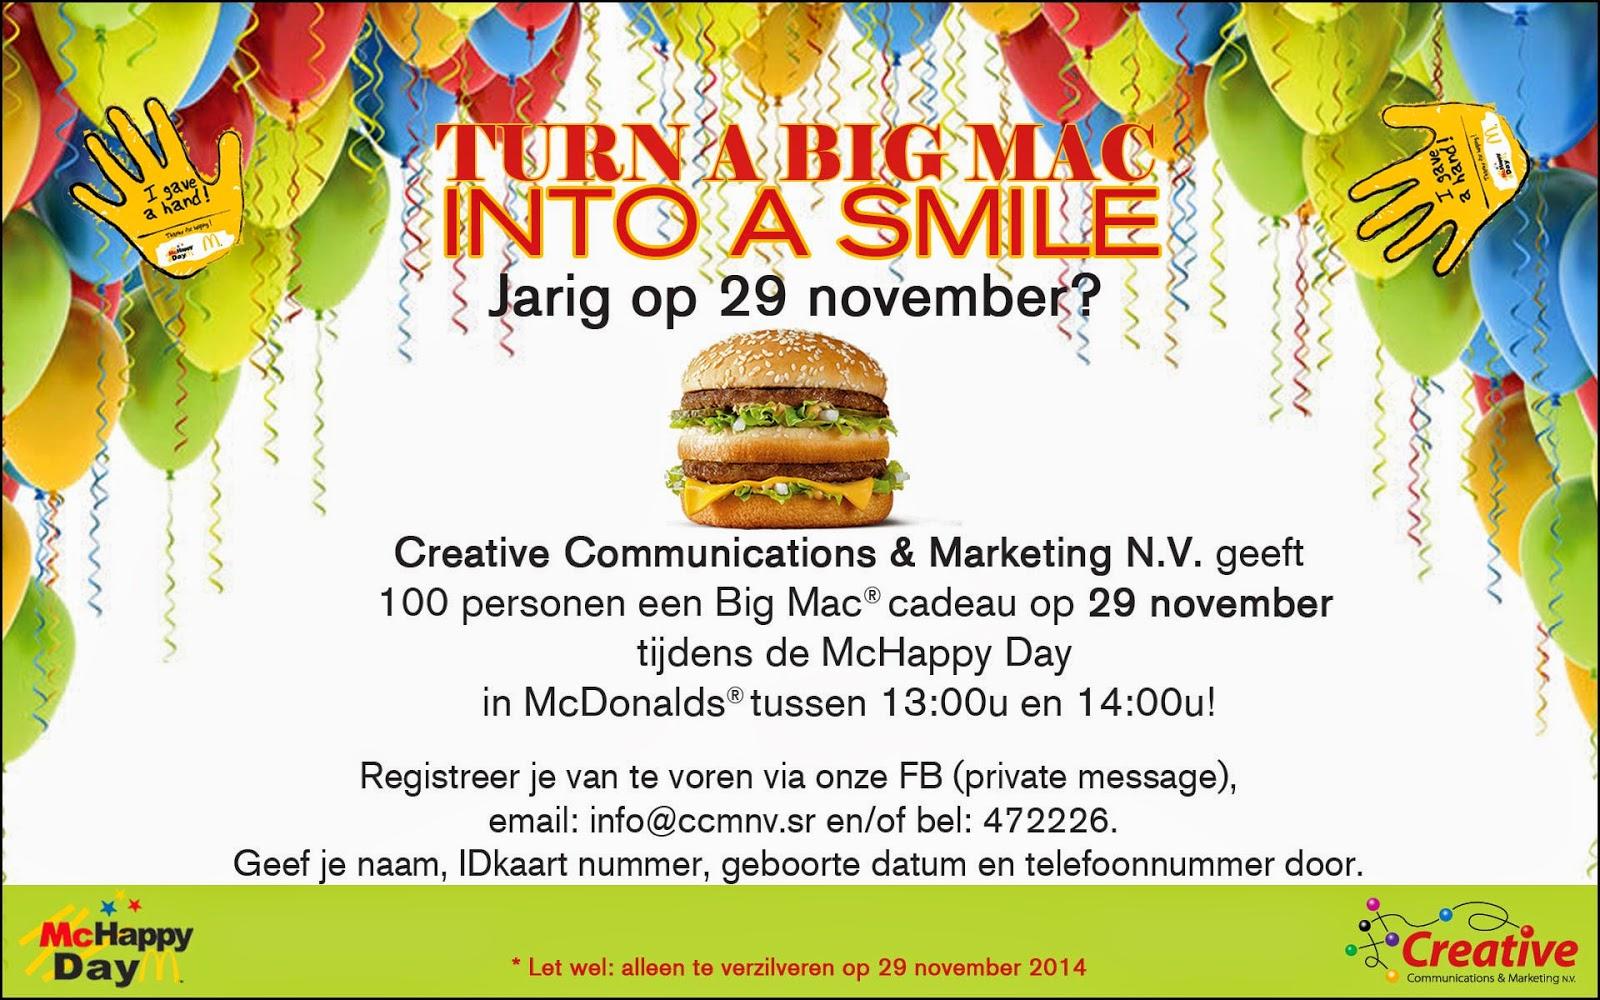 Ben je op 29 november jarig? Krijg een Big Mac cadeau!